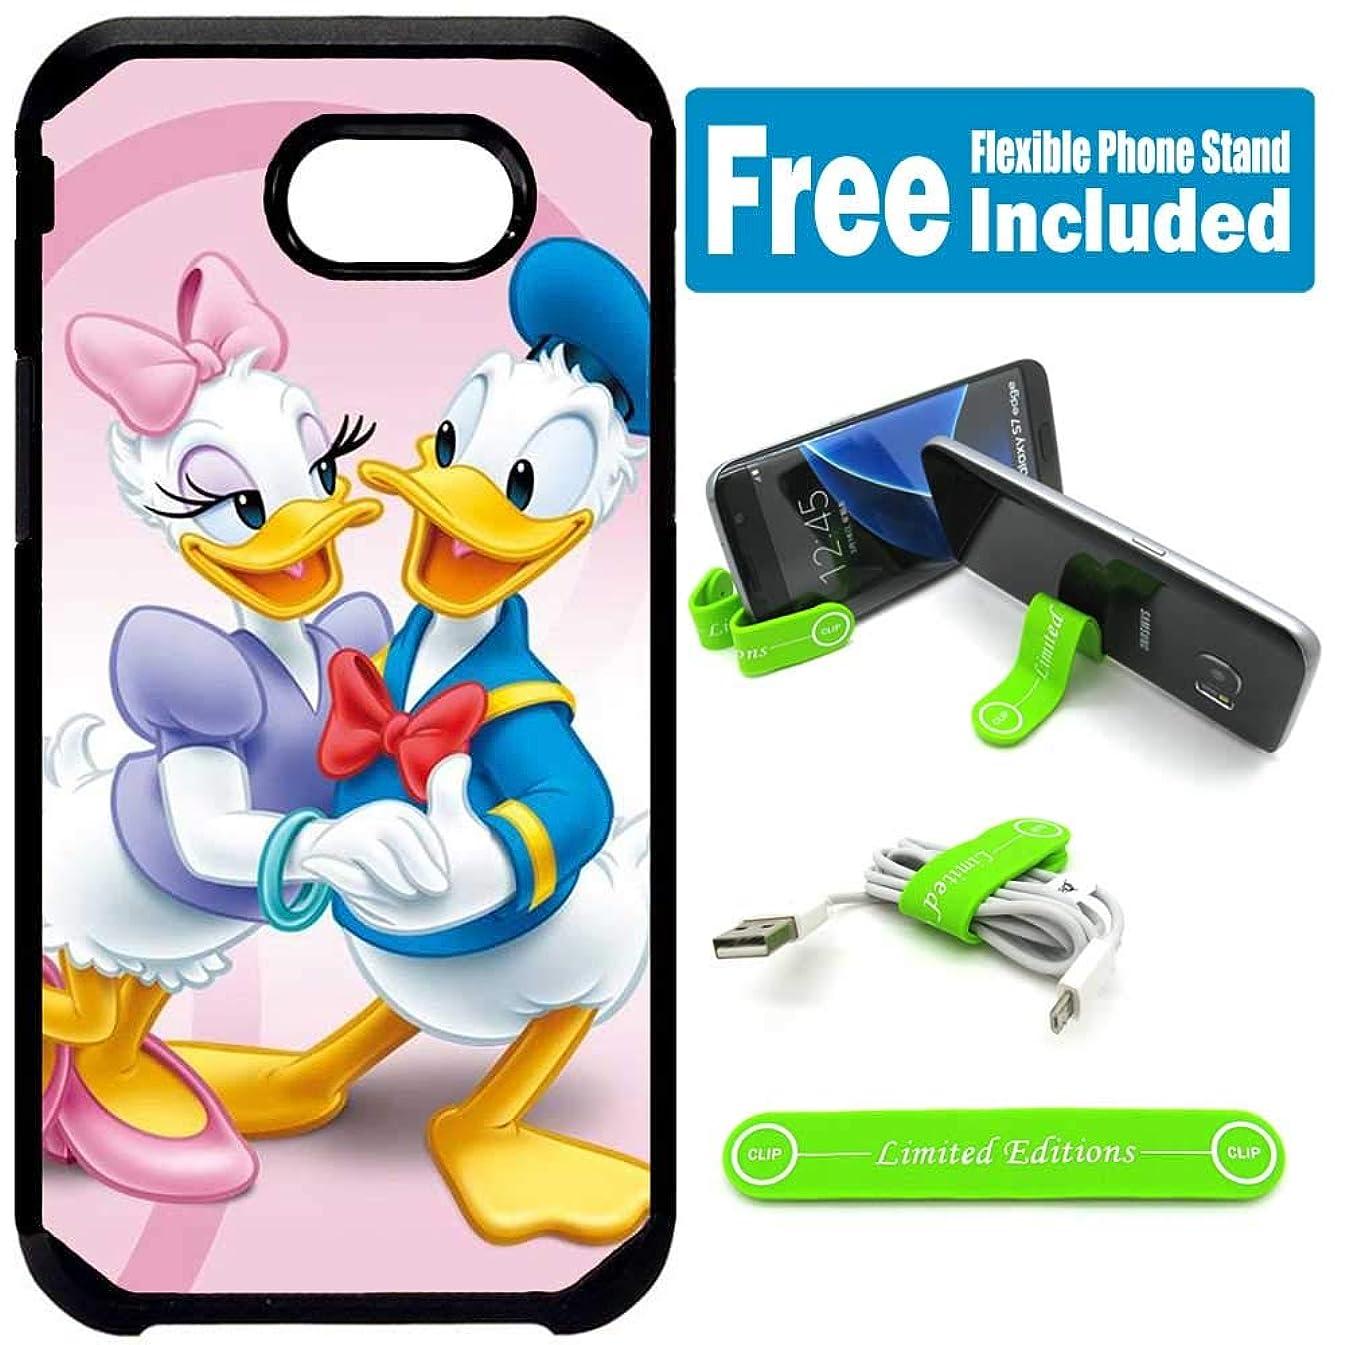 for Samsung Galaxy [J7 Prime] [J7 2017] [J7 Sky Pro] [J7 Perx] [J7 V] Defender Rugged Hard Cover Case - Donald Duck Couple Pink